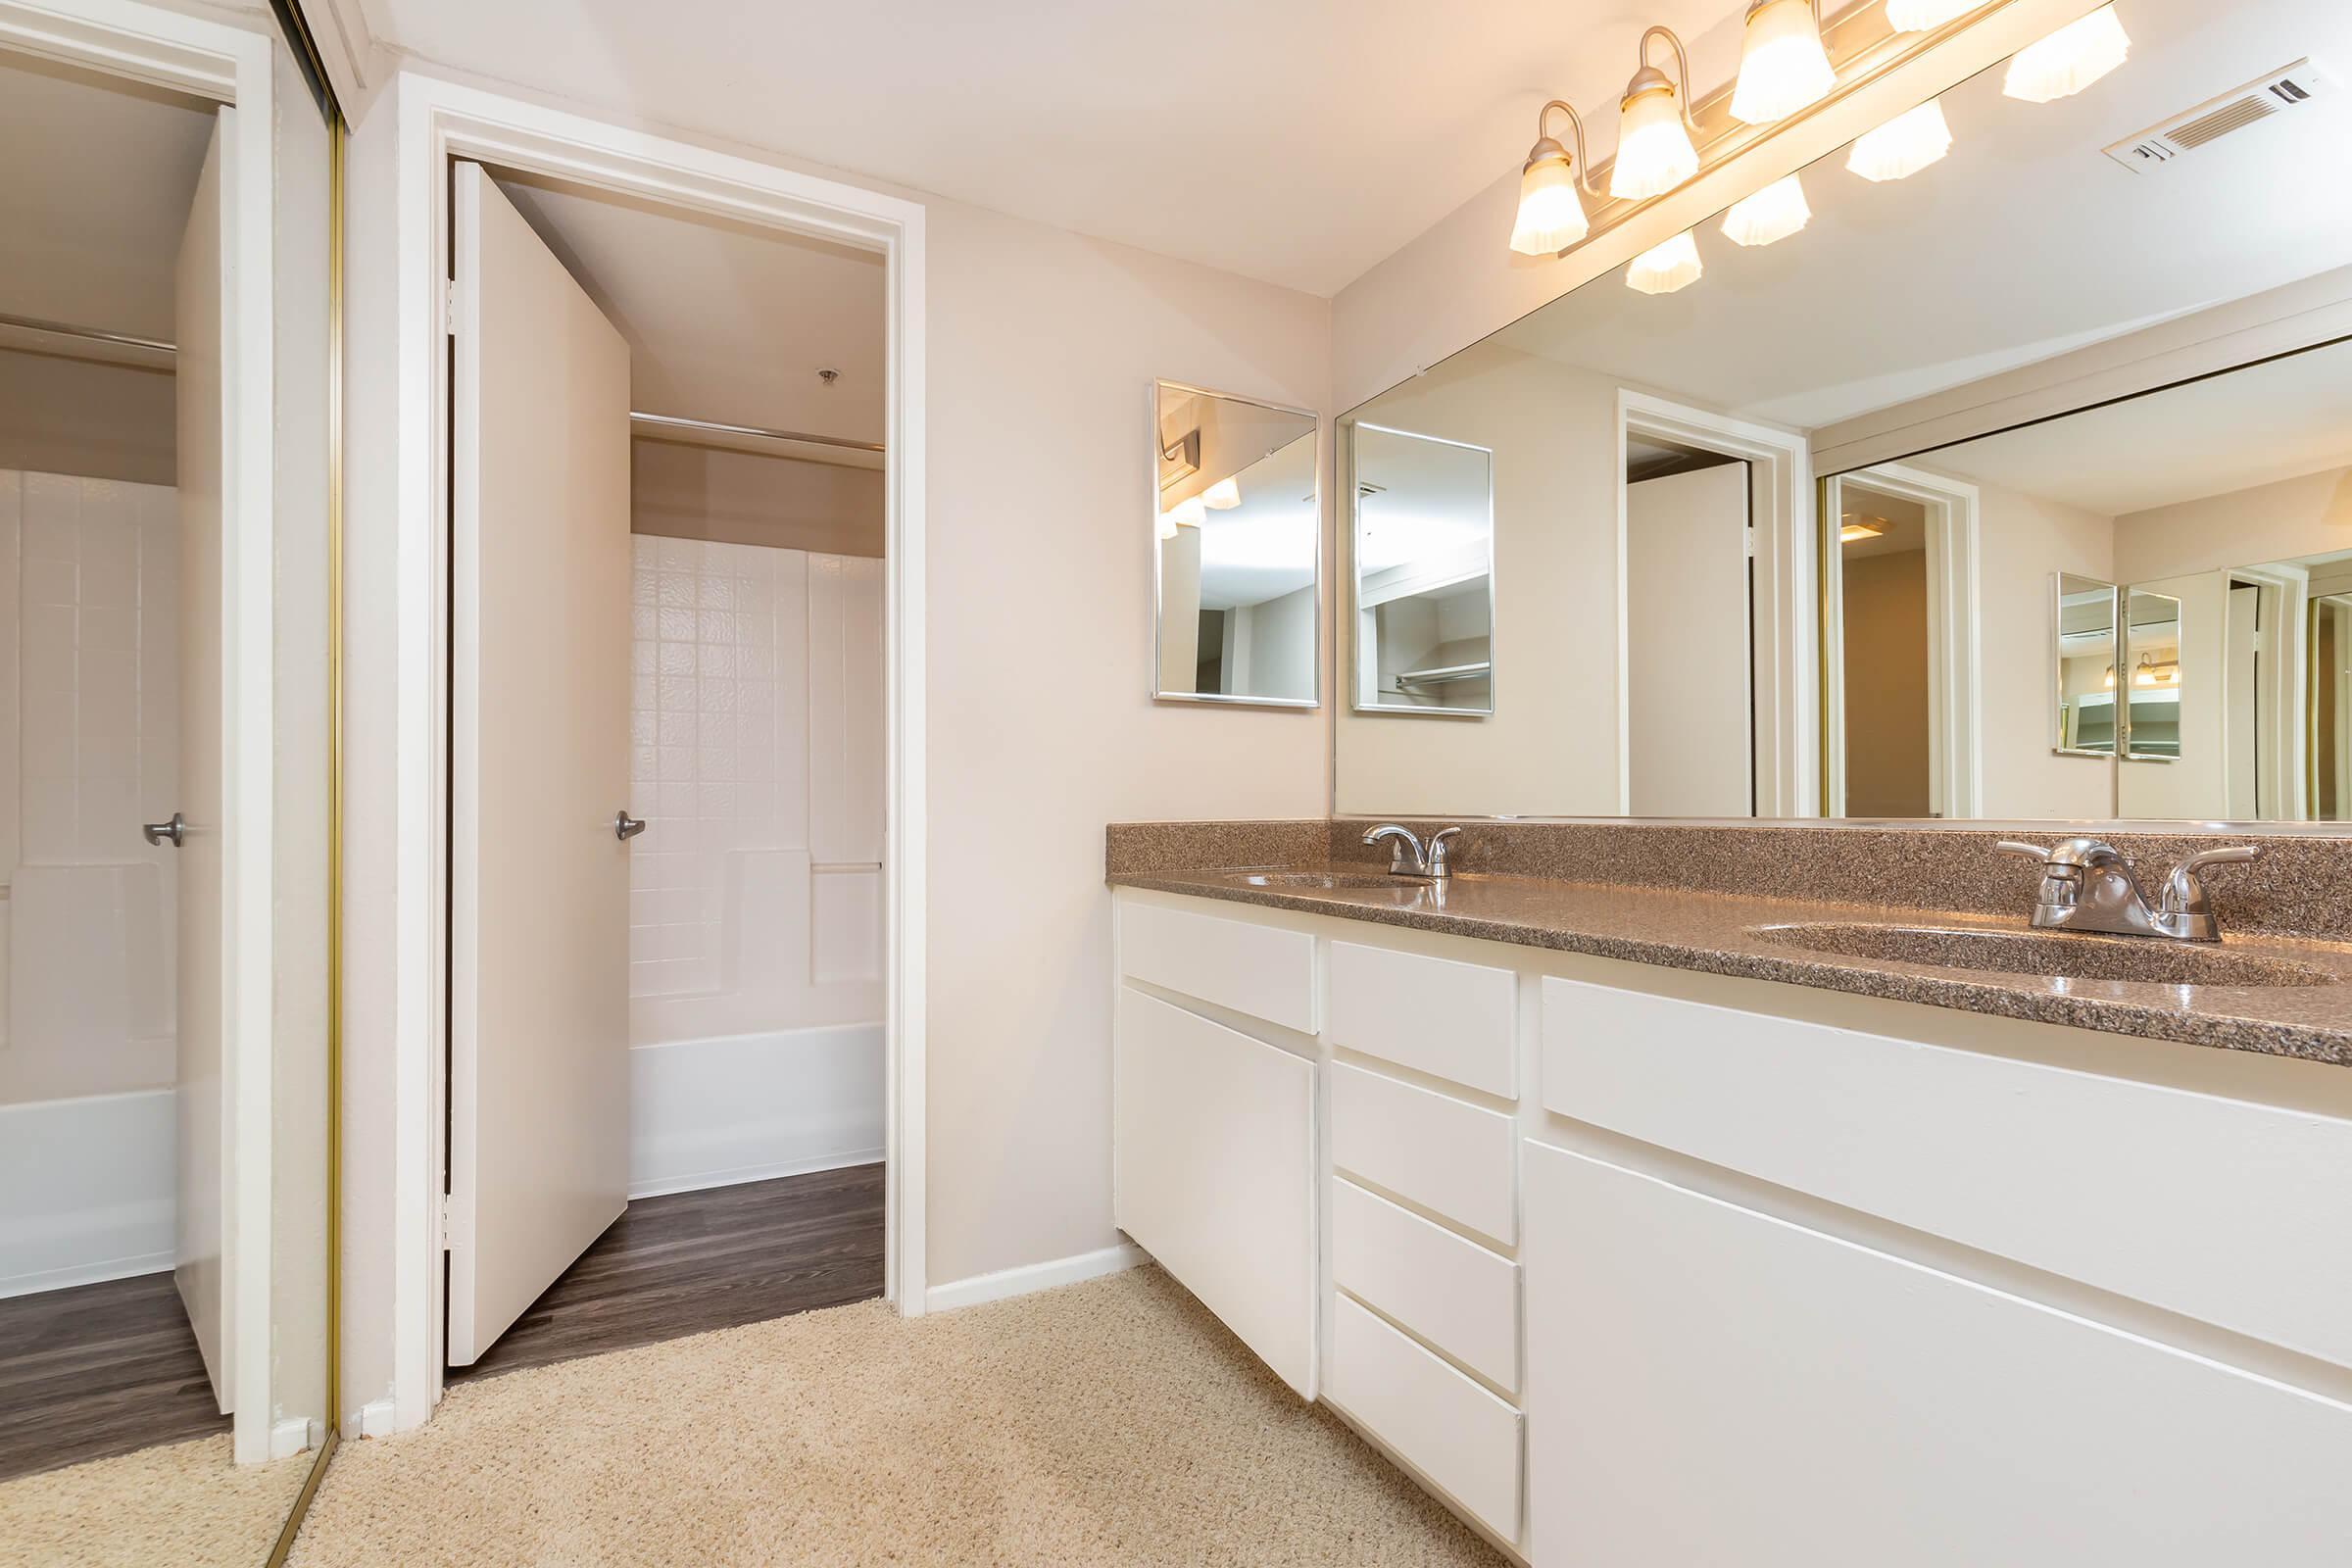 Two bathroom sinks across from a sliding mirror glass closet door